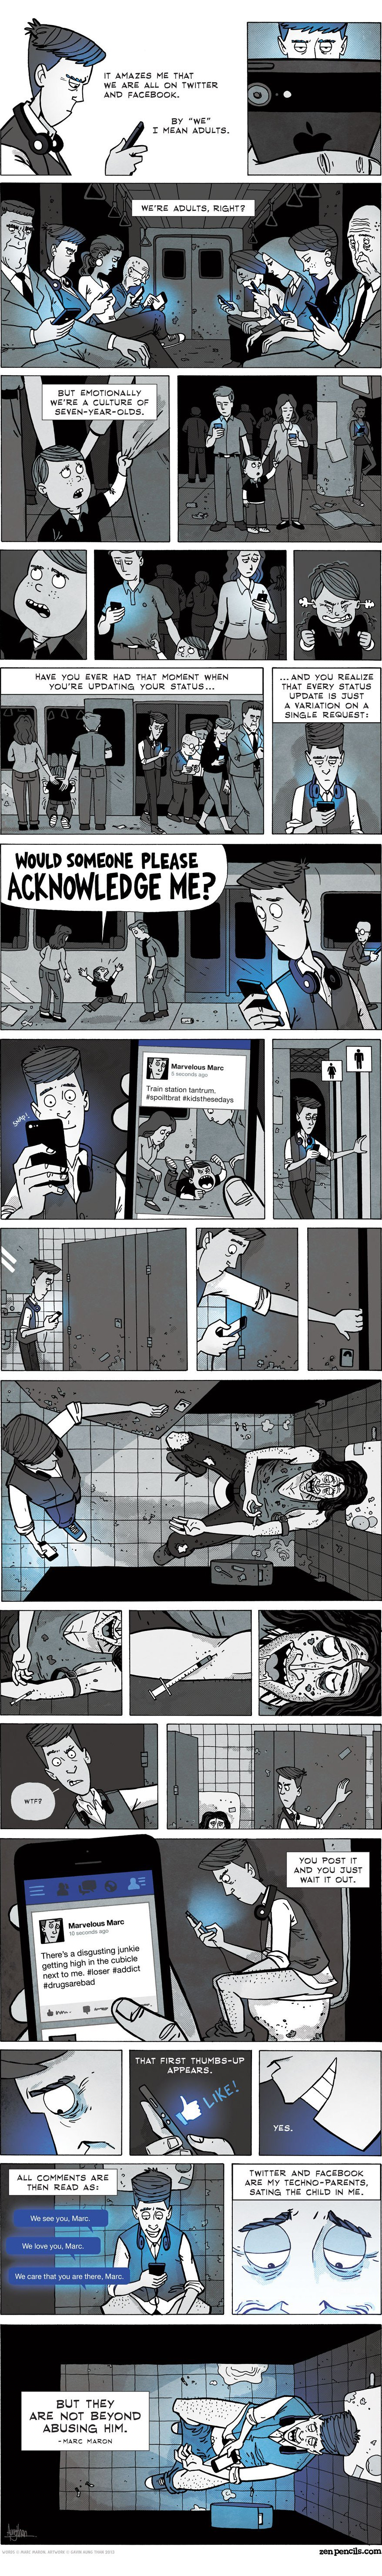 comic-social-media-generation-facebook-user1